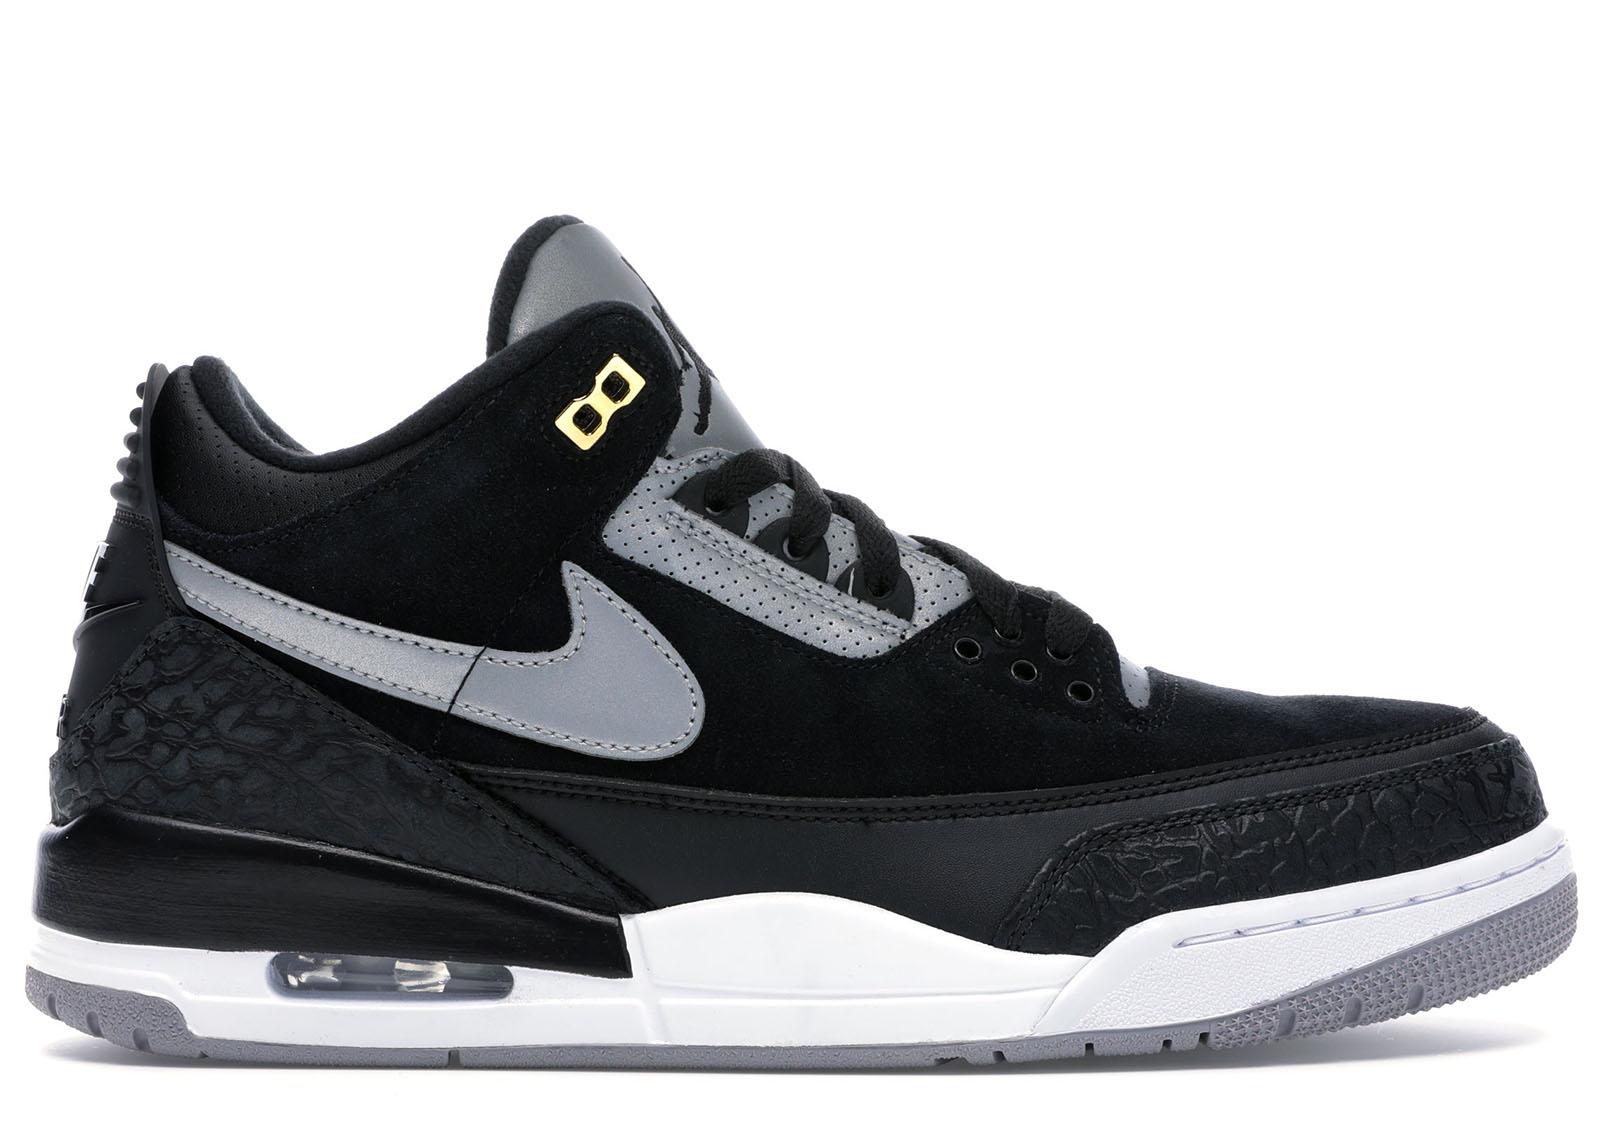 black 3s jordans